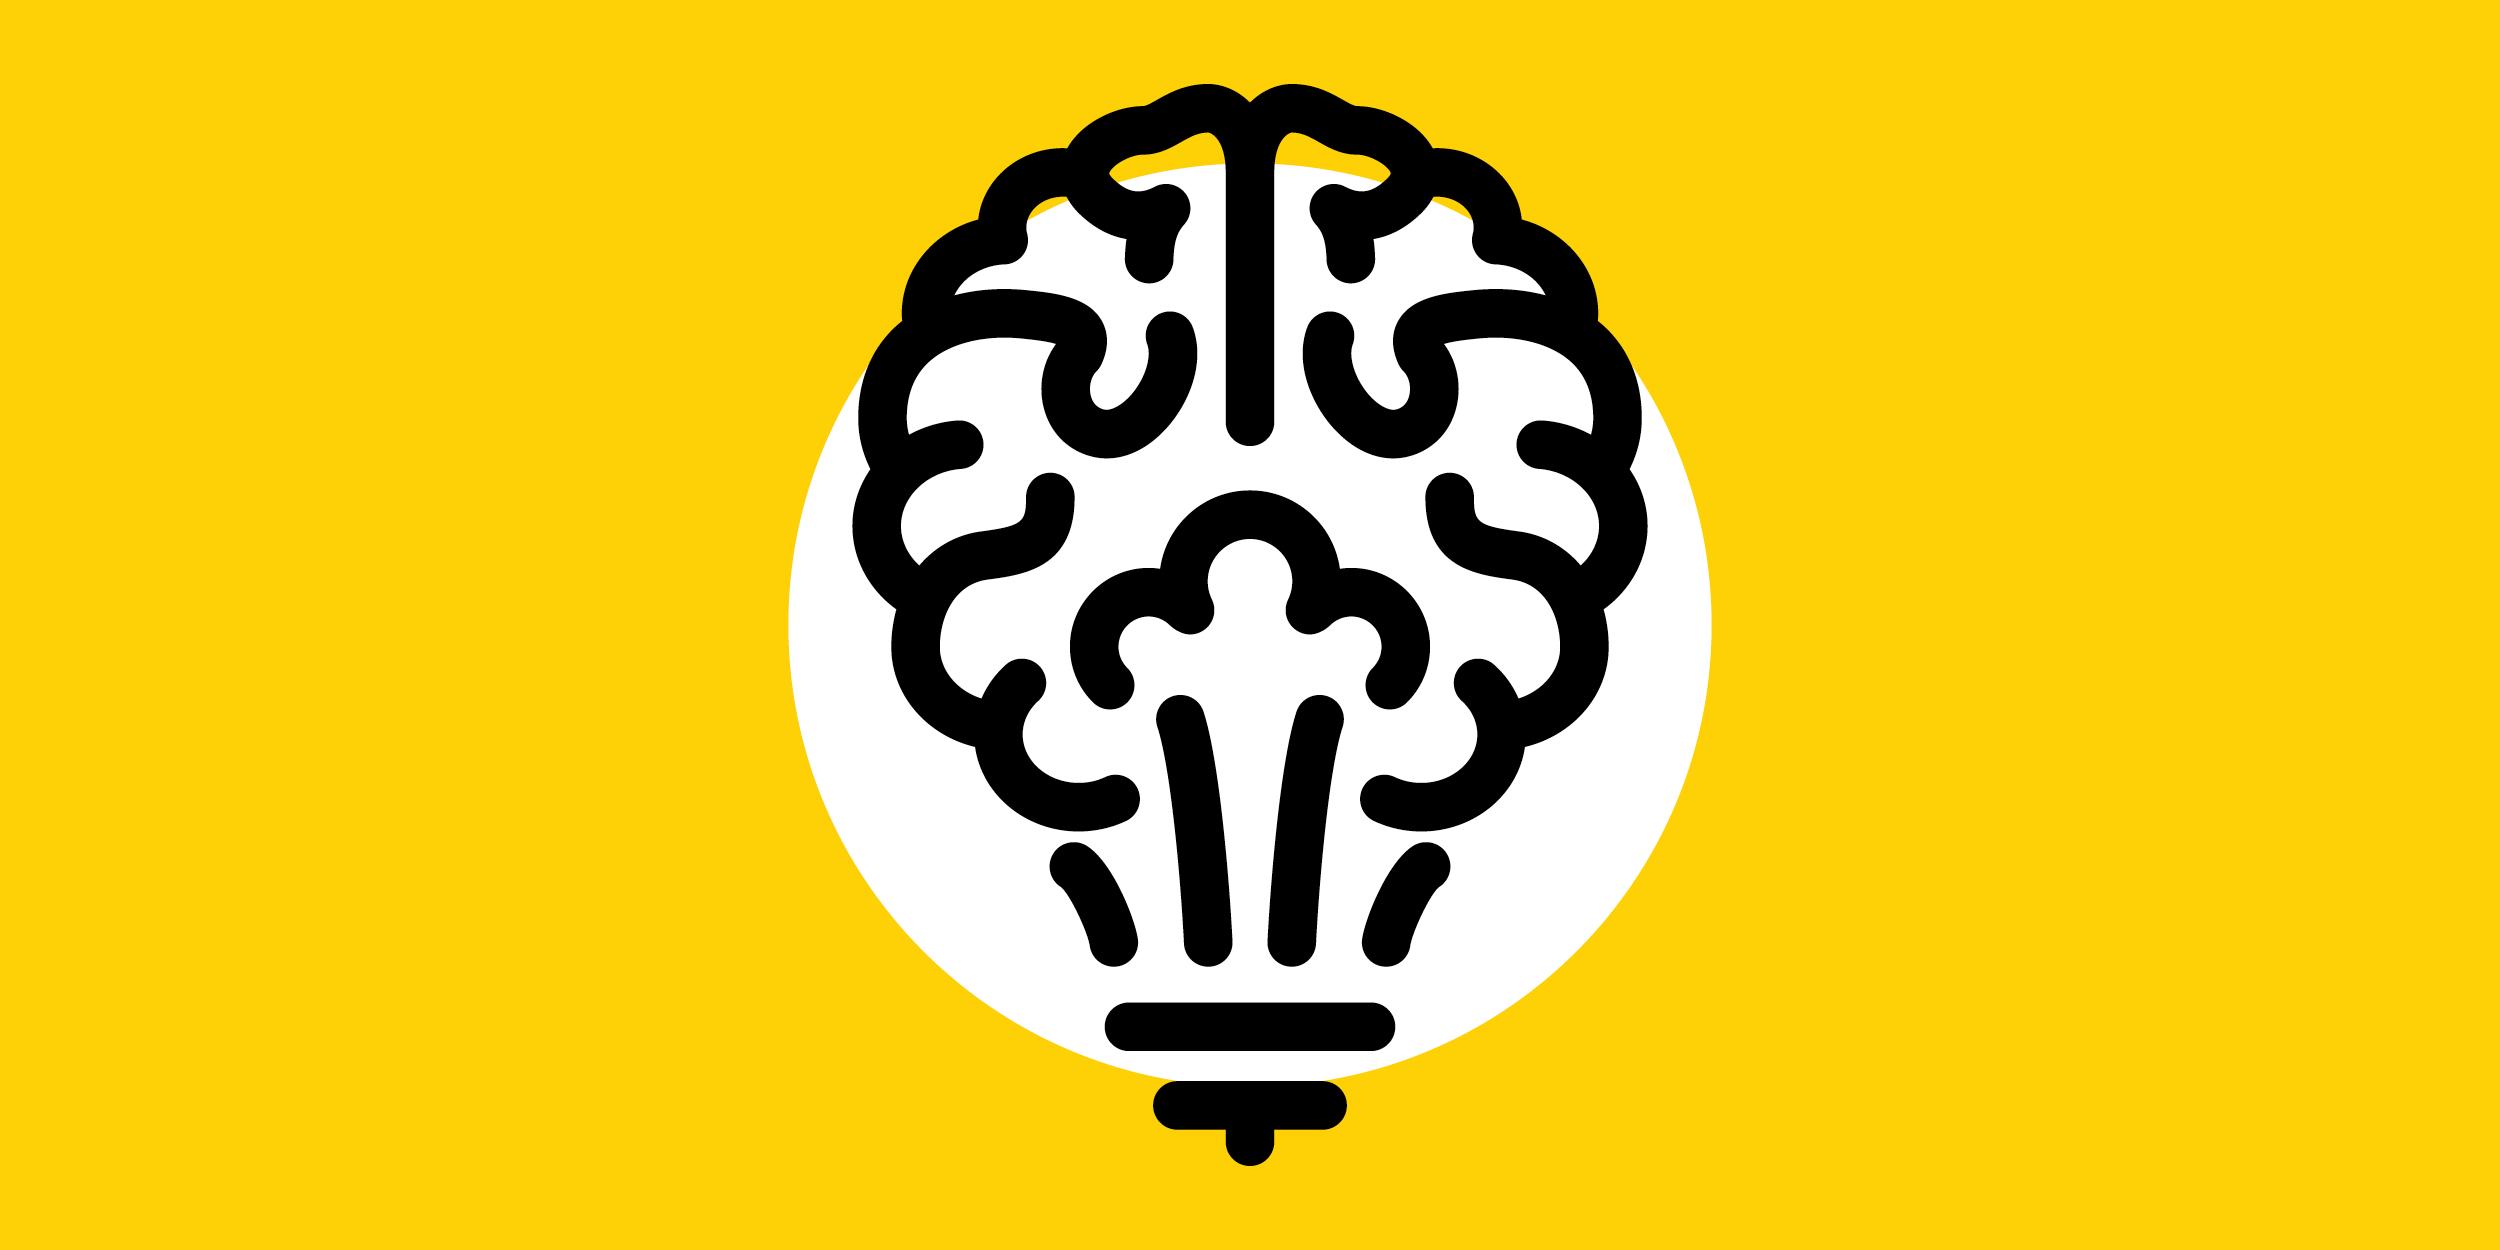 illustration of a brain functioning as a lightbulb